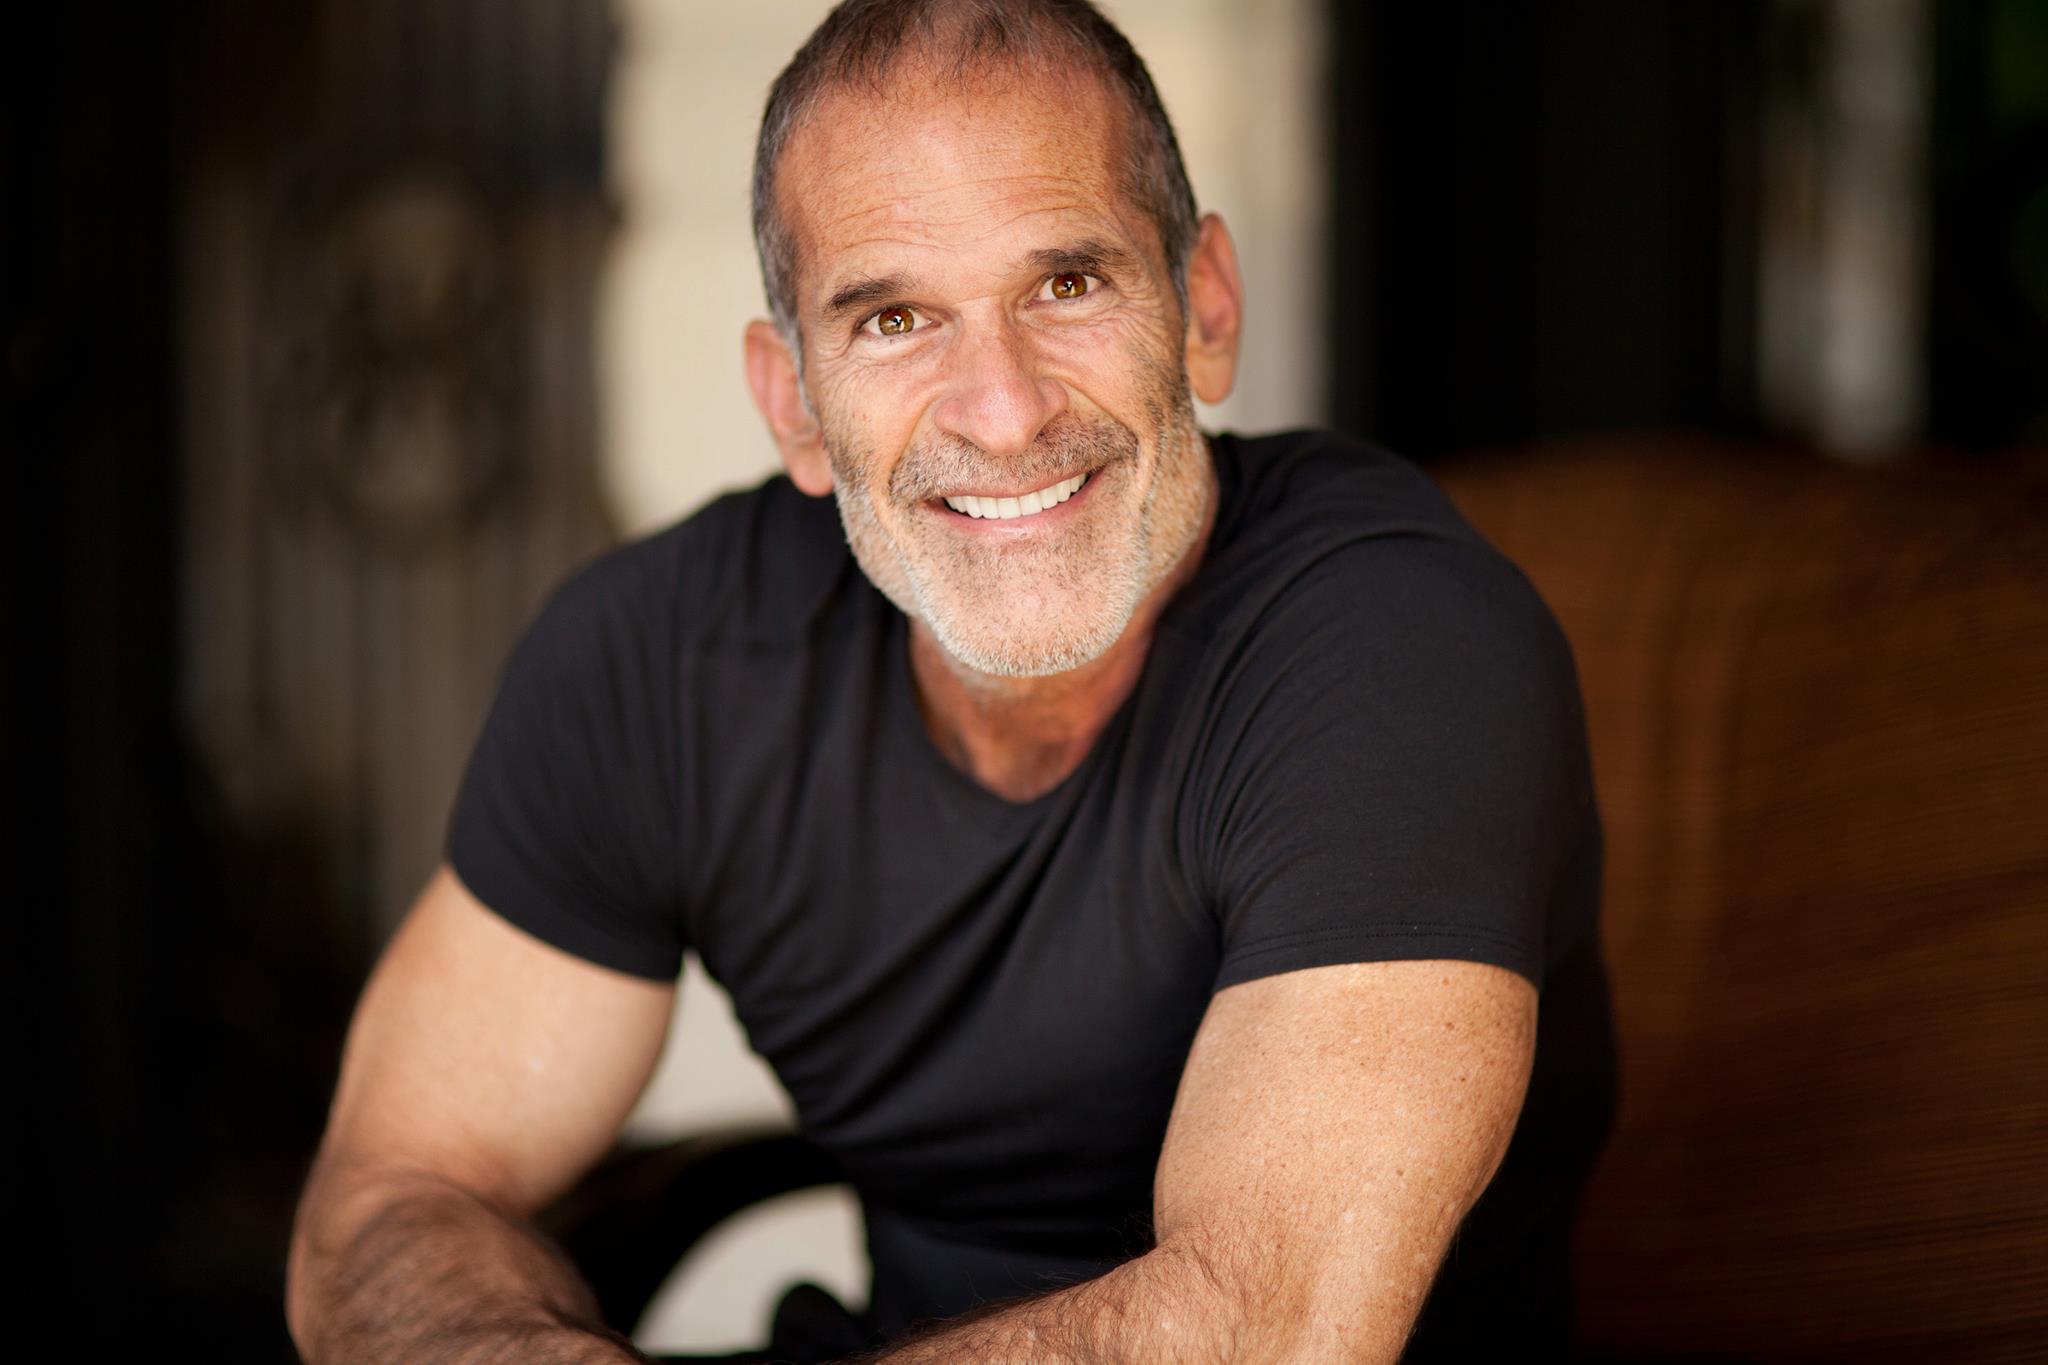 Mike Moore  | Author, Speaker, Entreprenuer